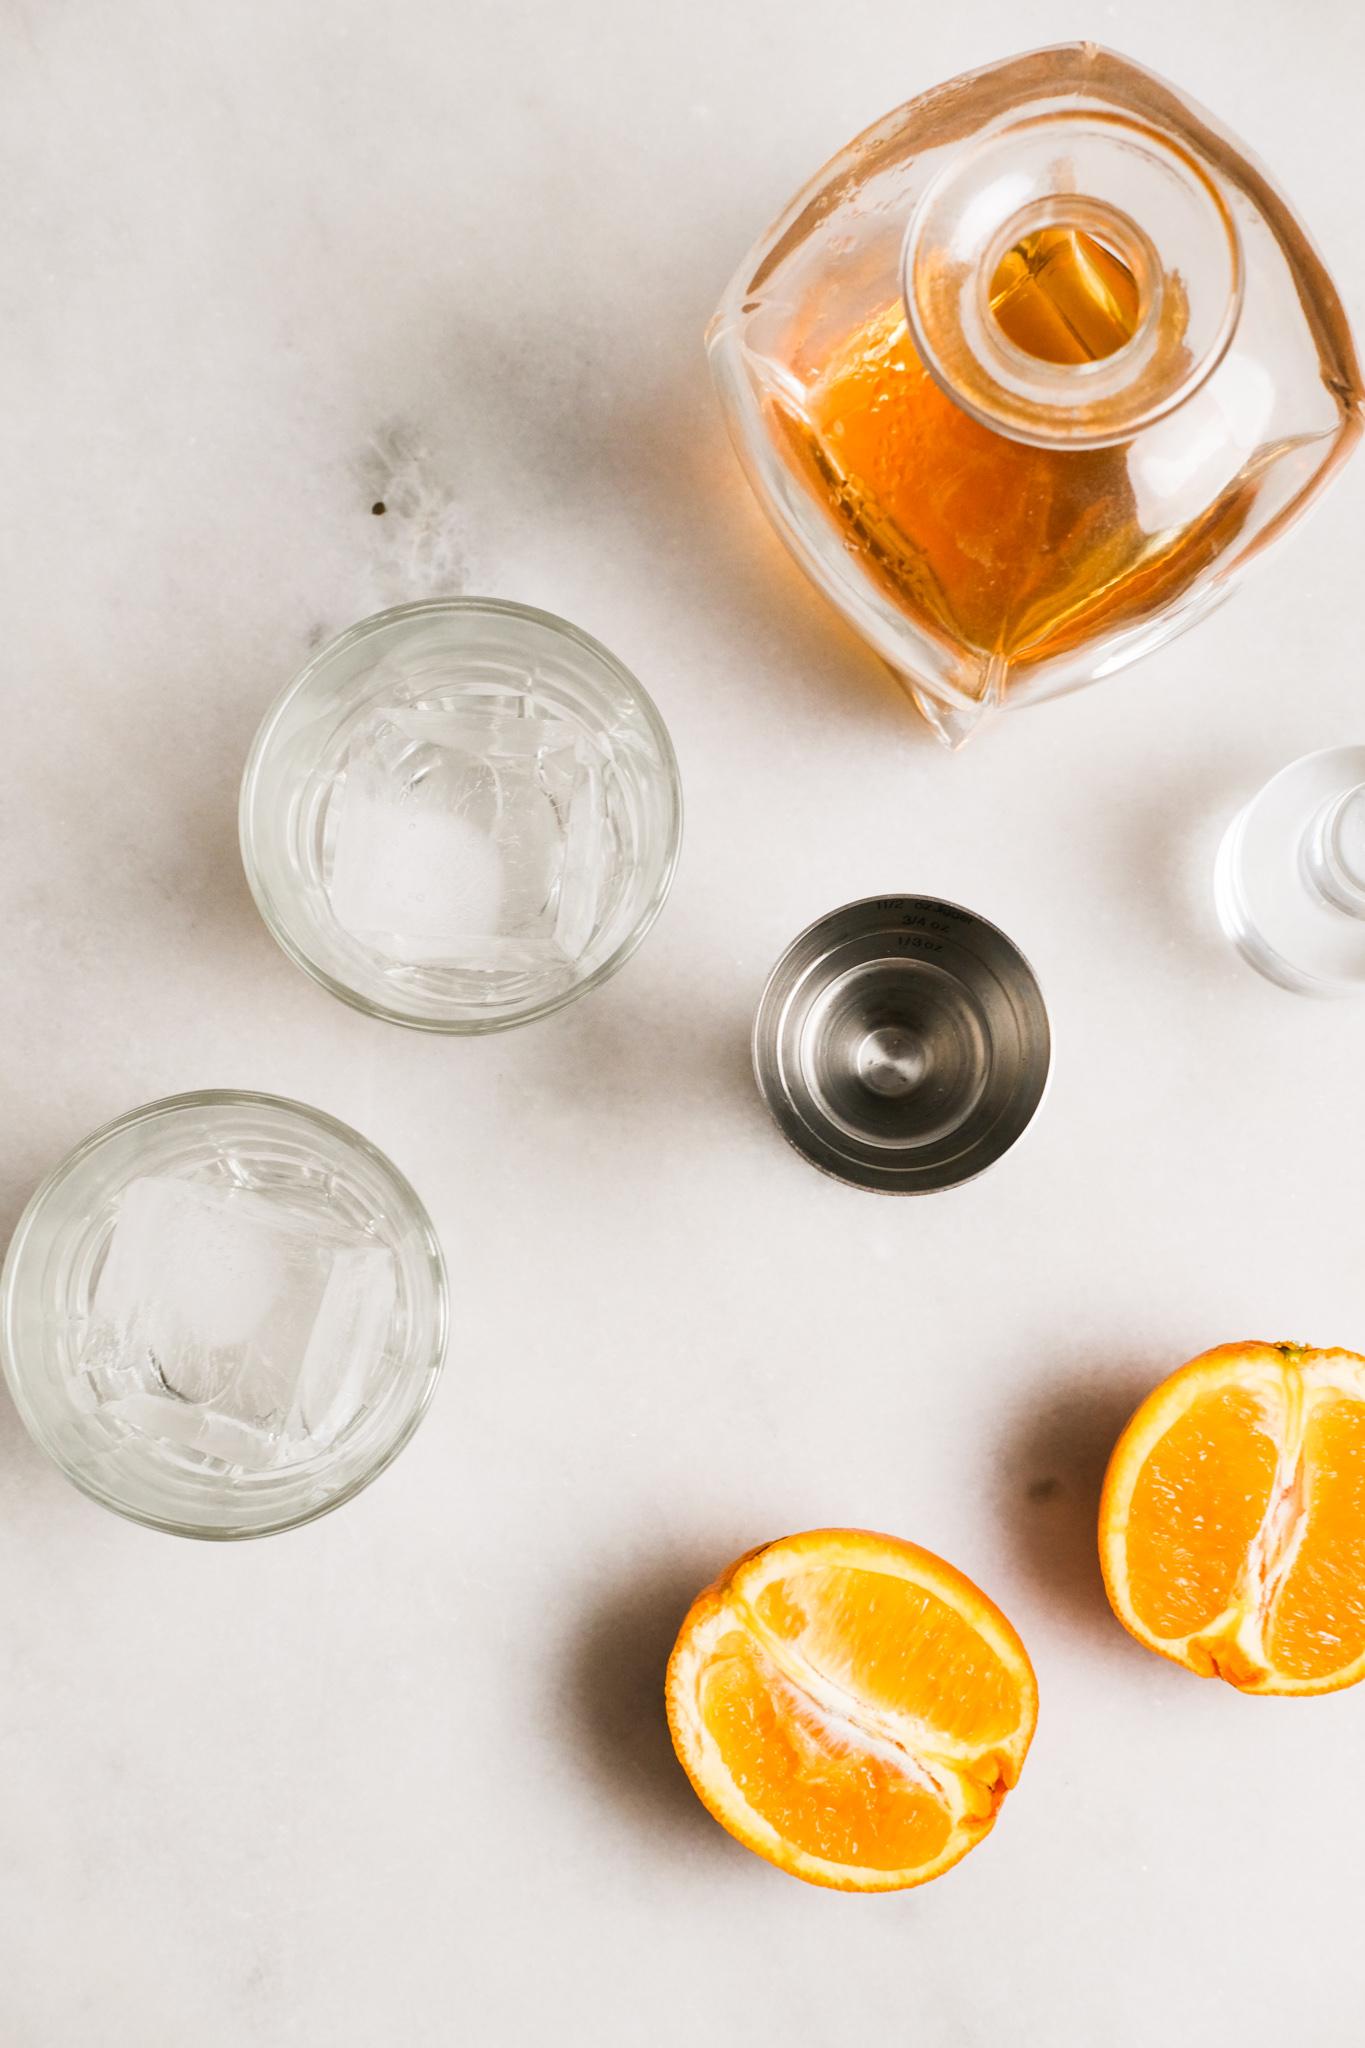 getting prepared to make an orange whiskey sour recipe